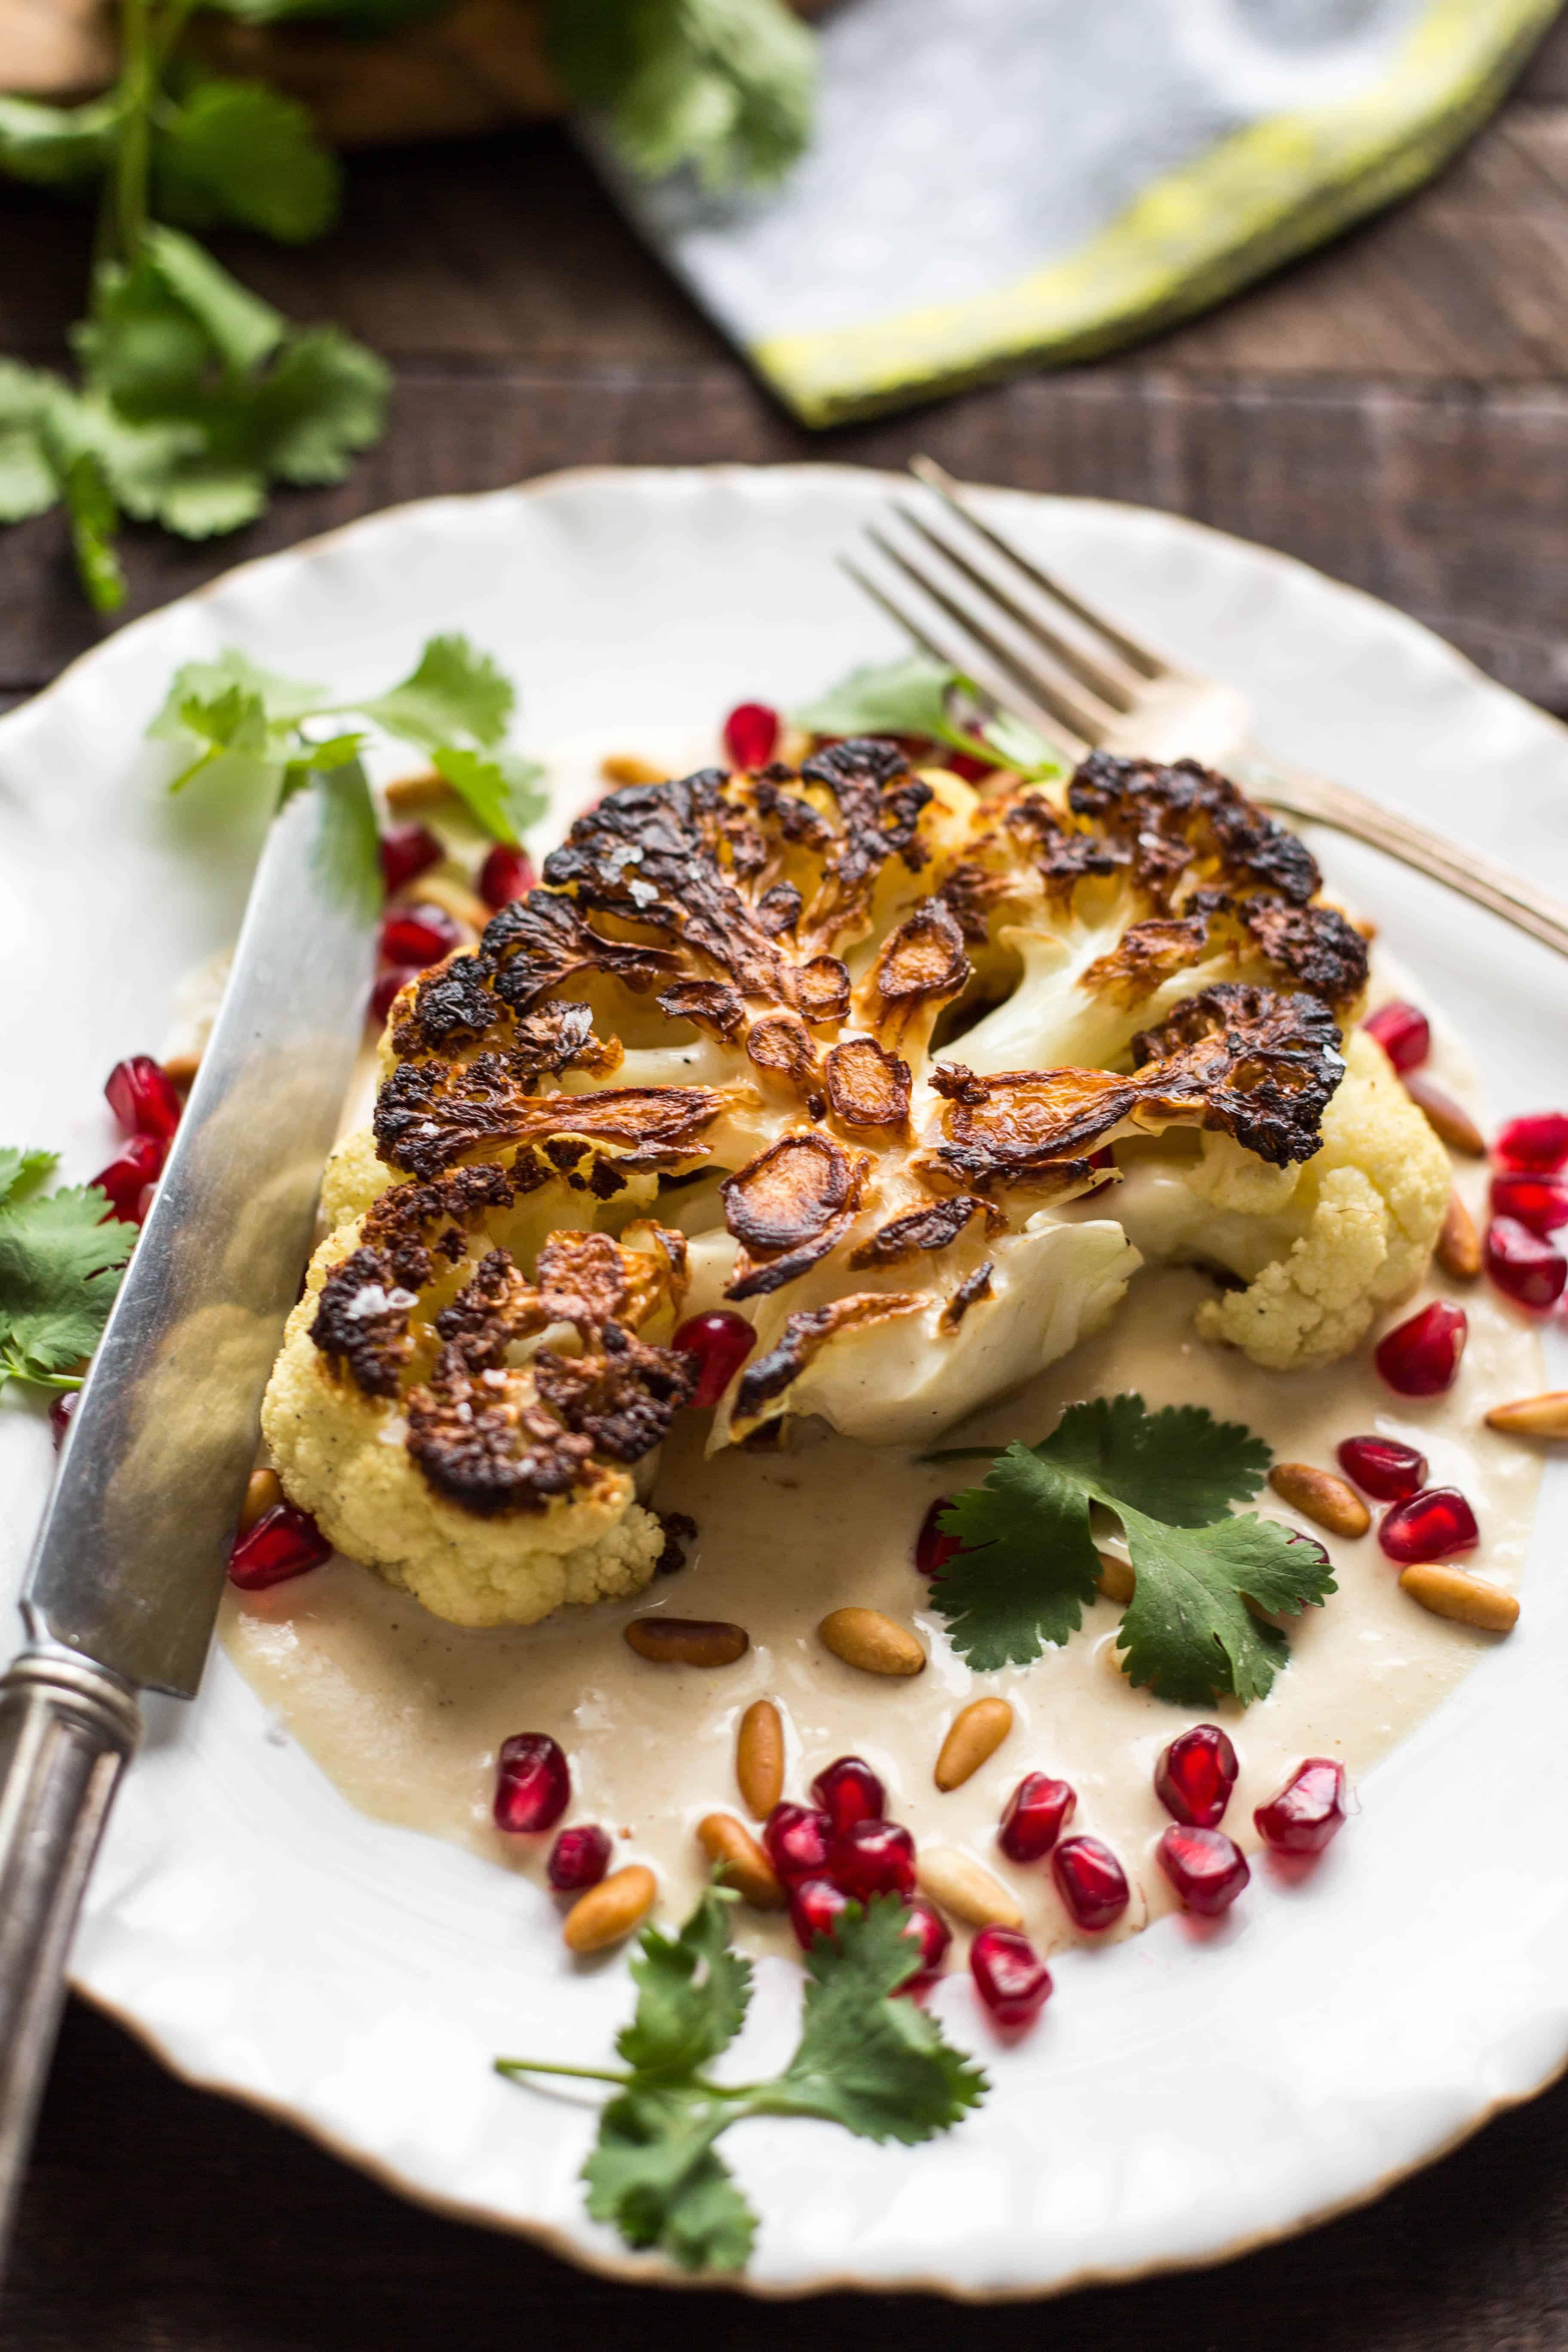 Cauliflower Steaks with Tahini and Pomegranate